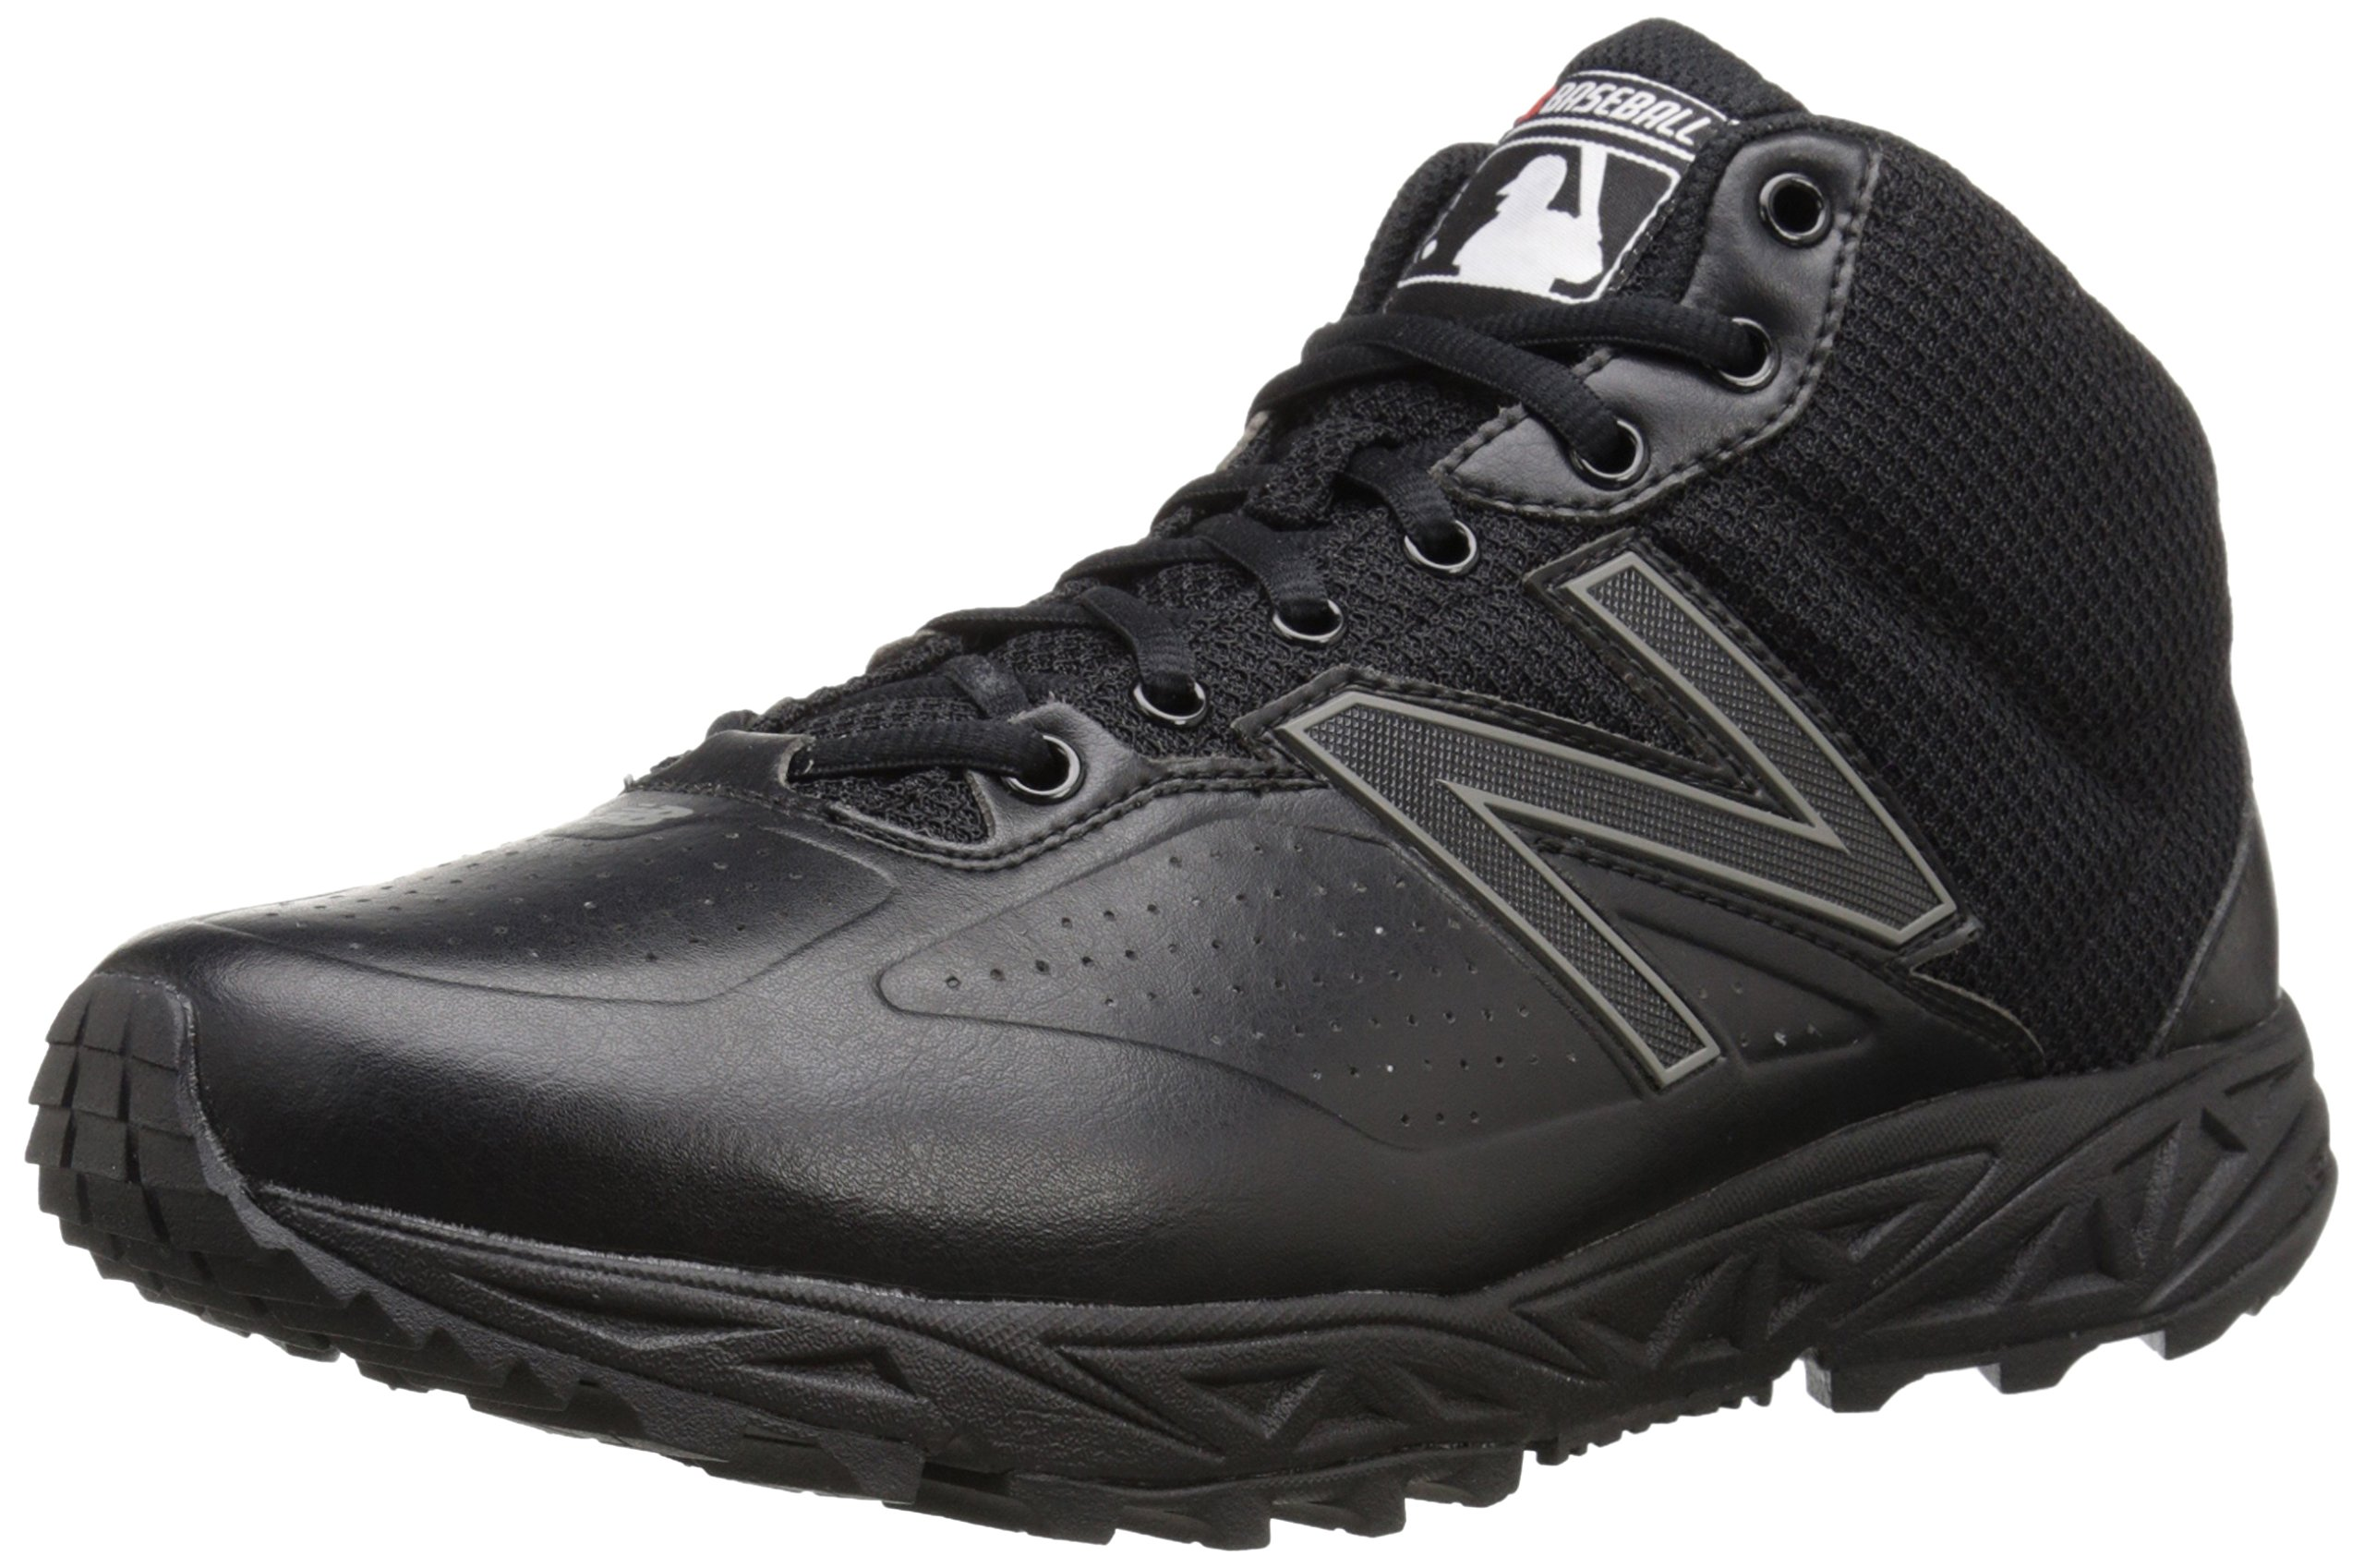 New Balance Men's MU950V2 Umpire Mid Shoe-M, Black, 7.5 2E US by New Balance